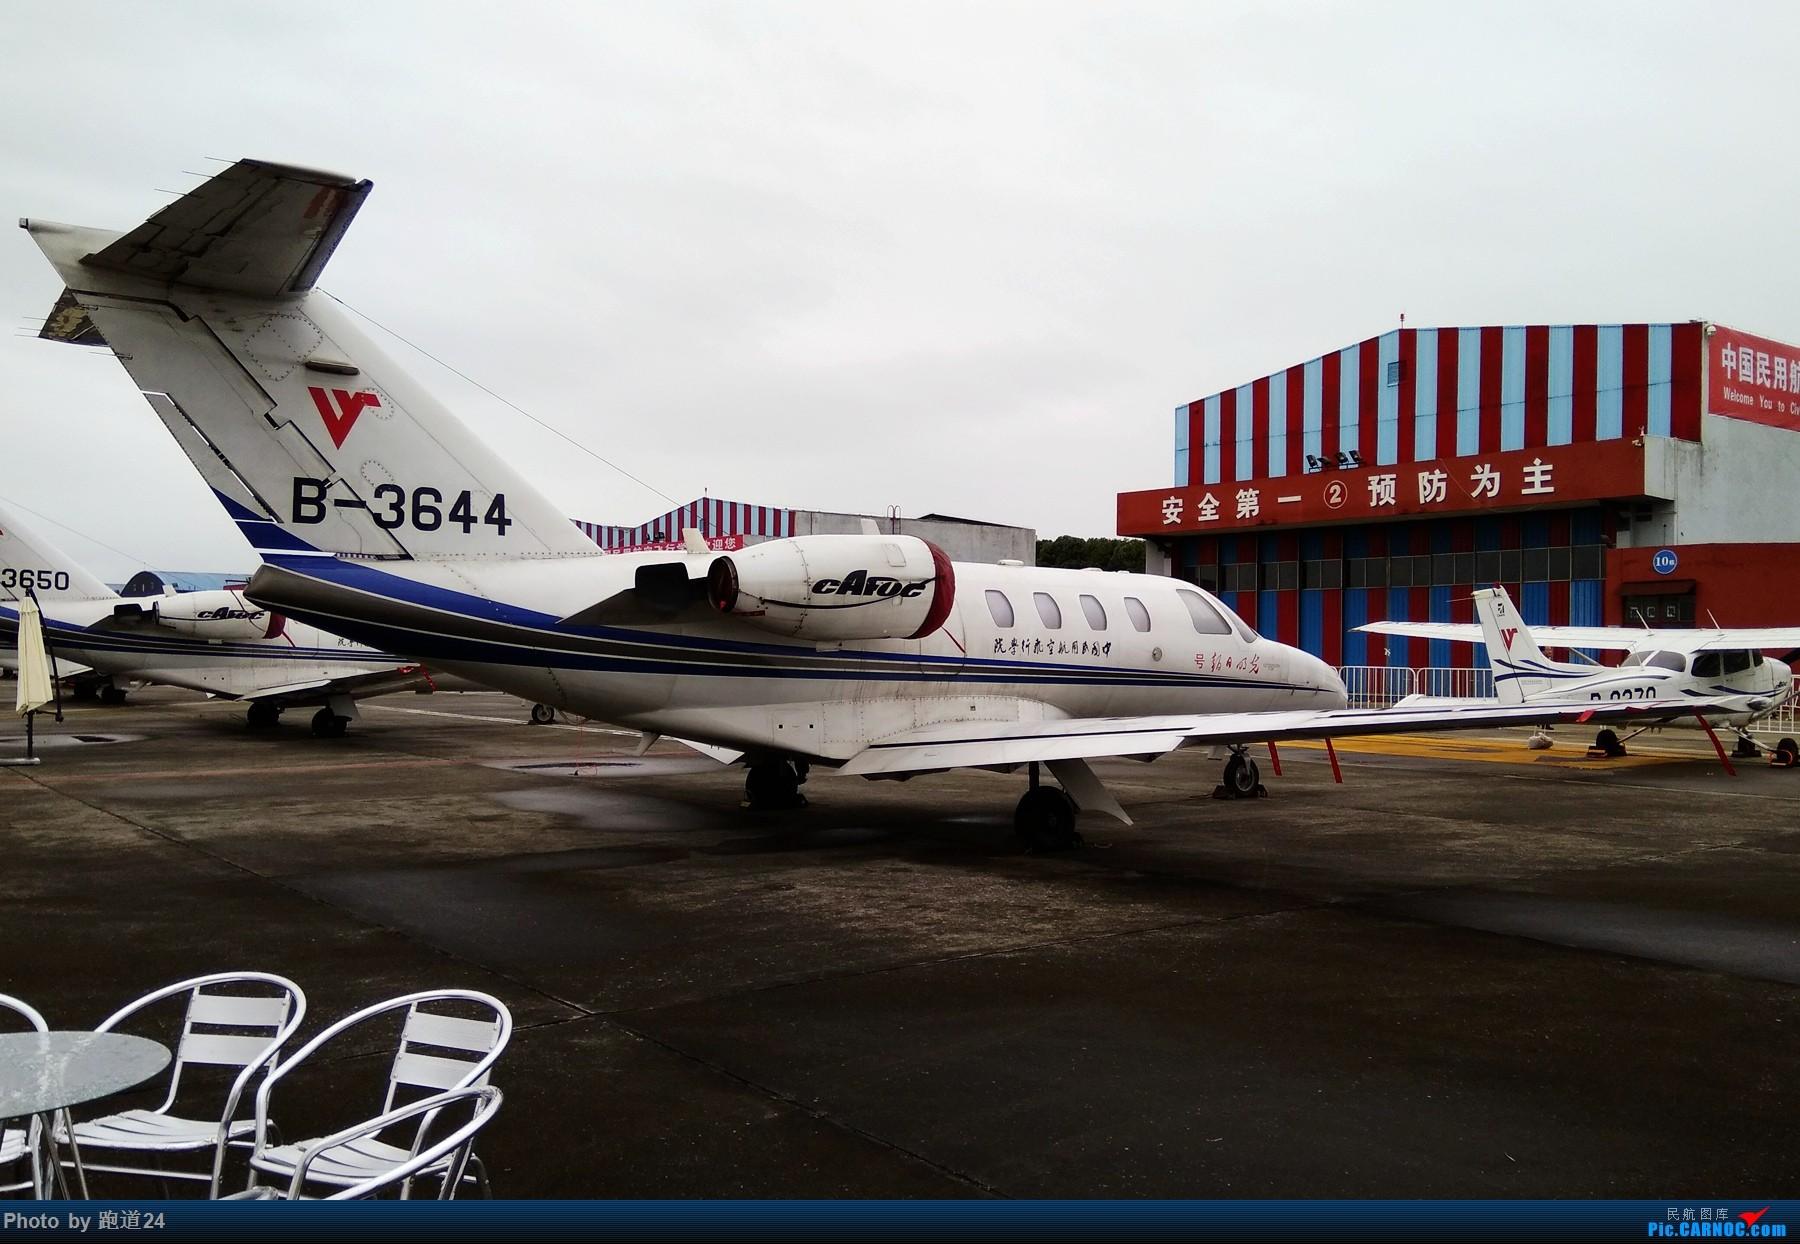 Re:[原创]【多图党】首次参观航展 CESSNA 525 B-3644 中国广汉机场